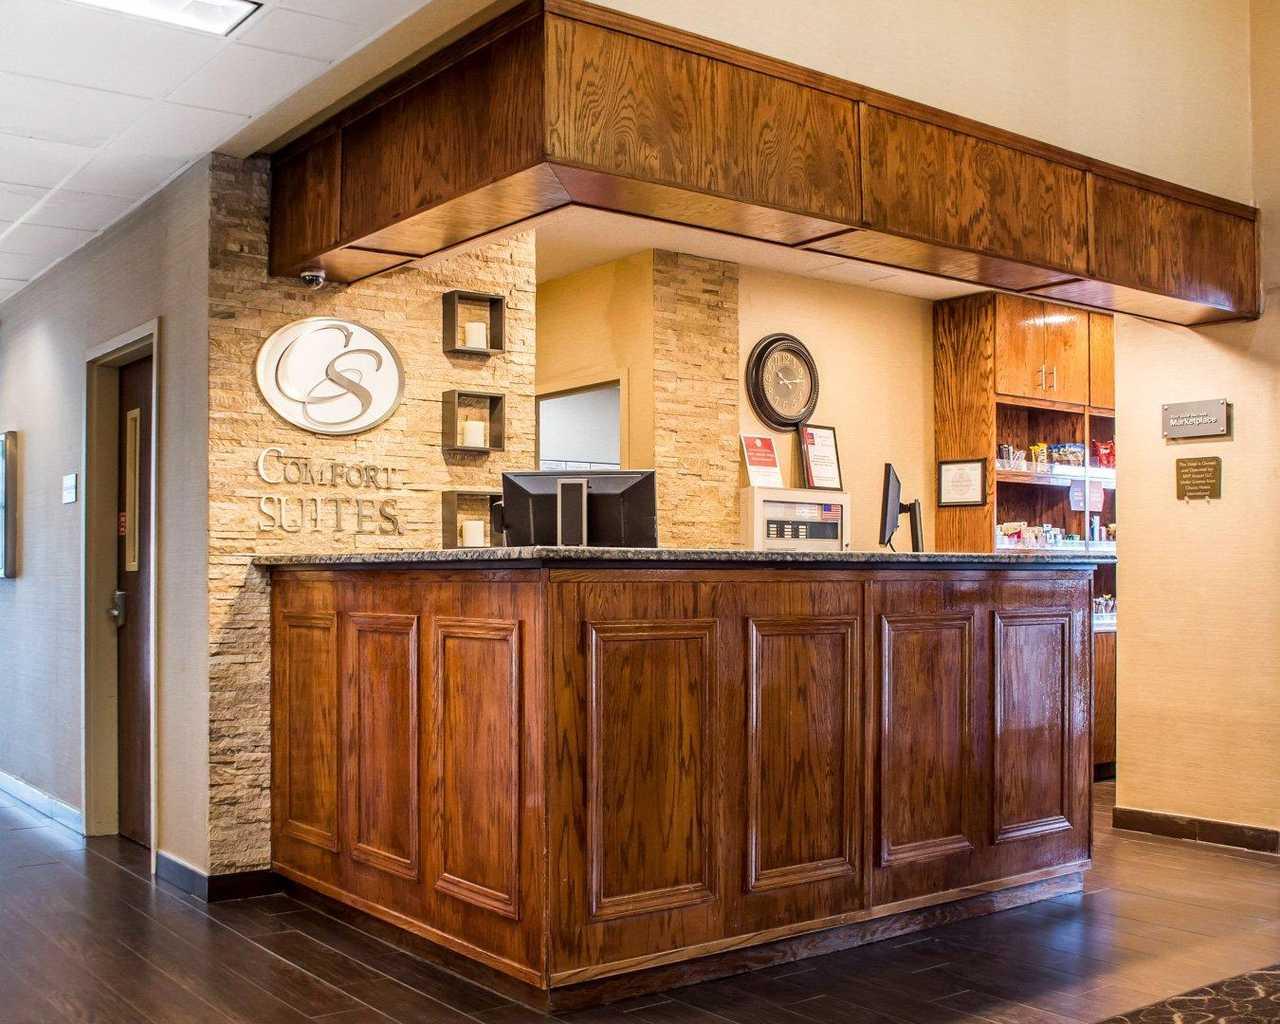 Comfort Suites Buffalo Airport New York | Hotel near Buffalo Zoo ...